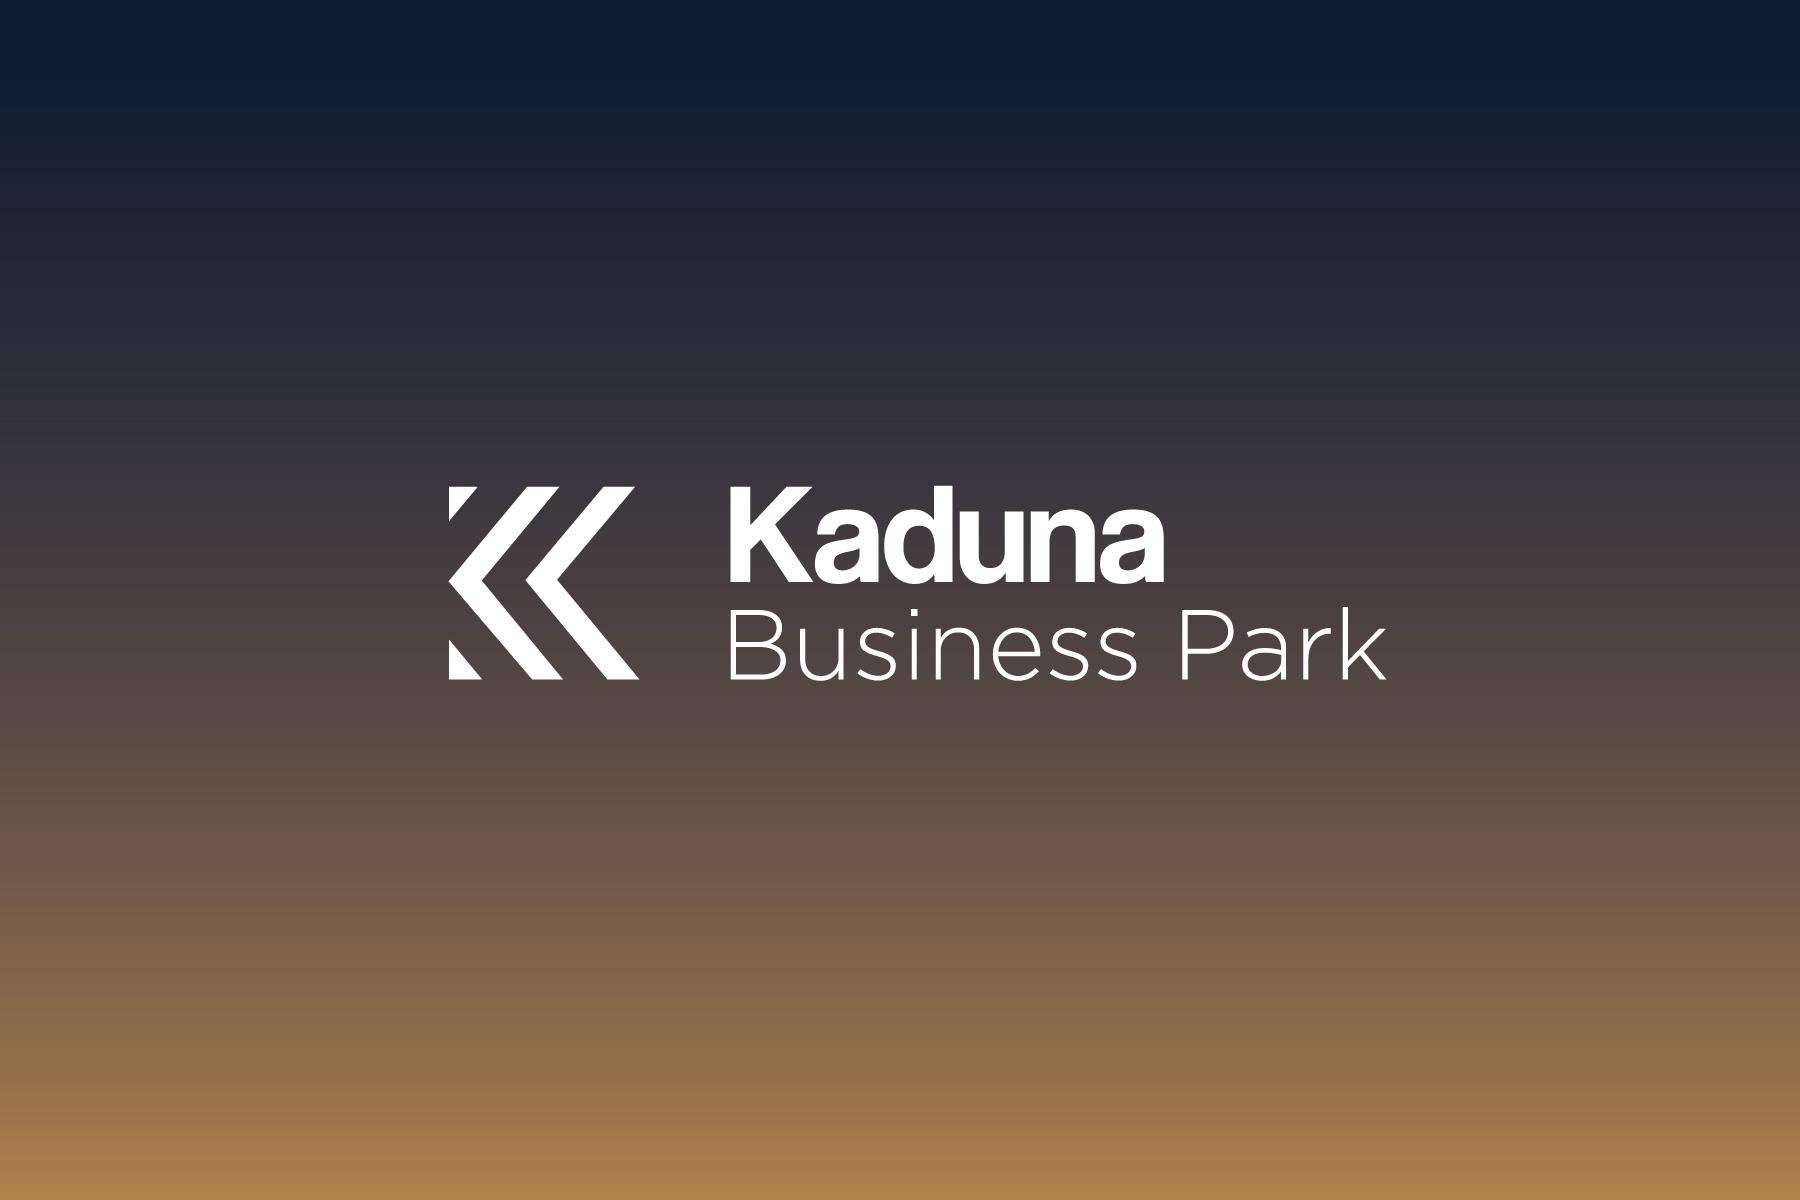 Kaduna Business Park, Officer South